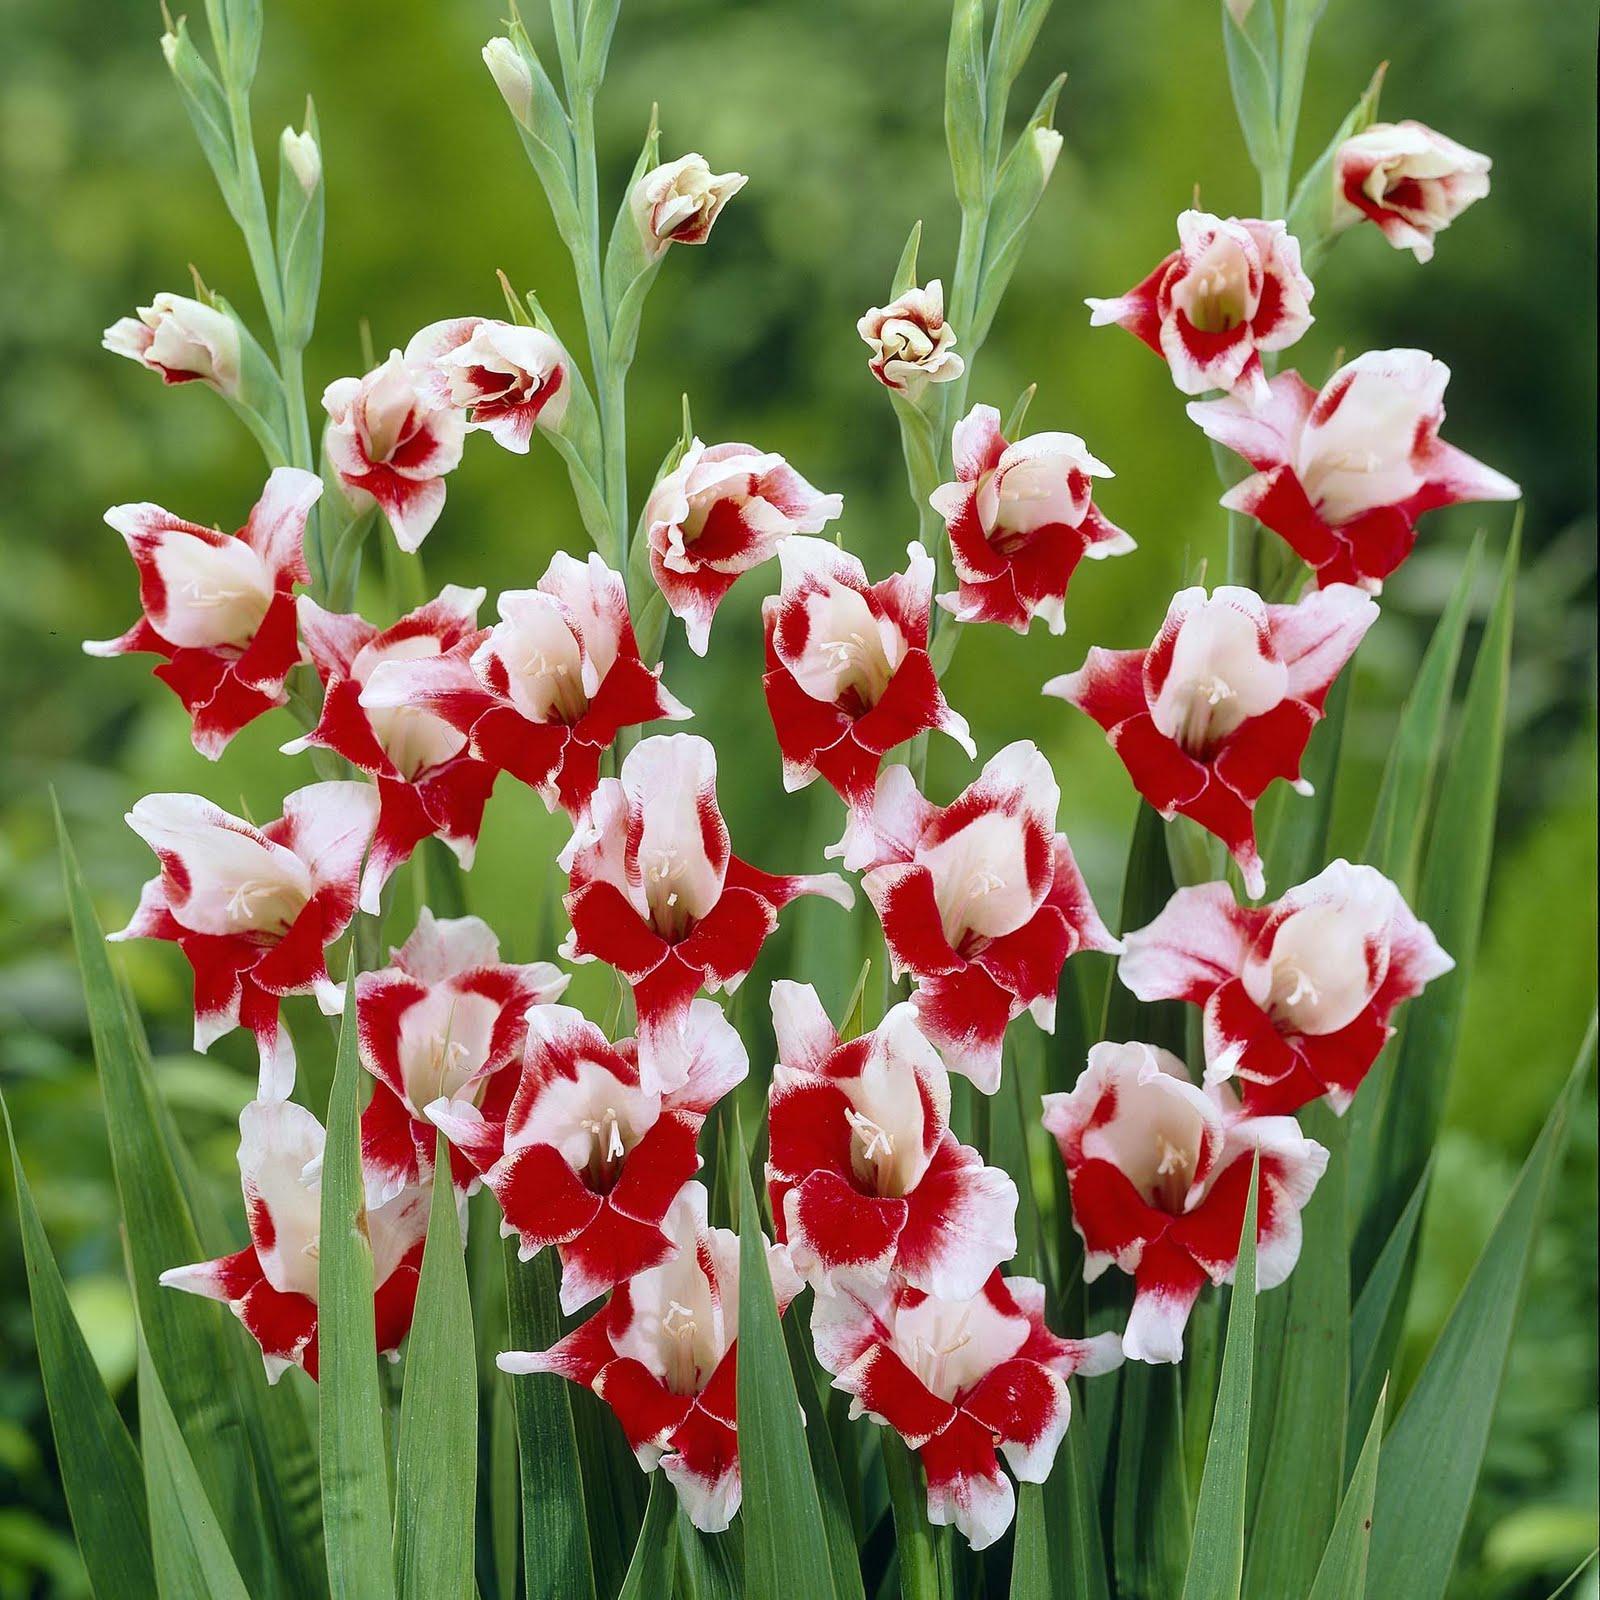 Gladiolus Flower Beautiful Flowers